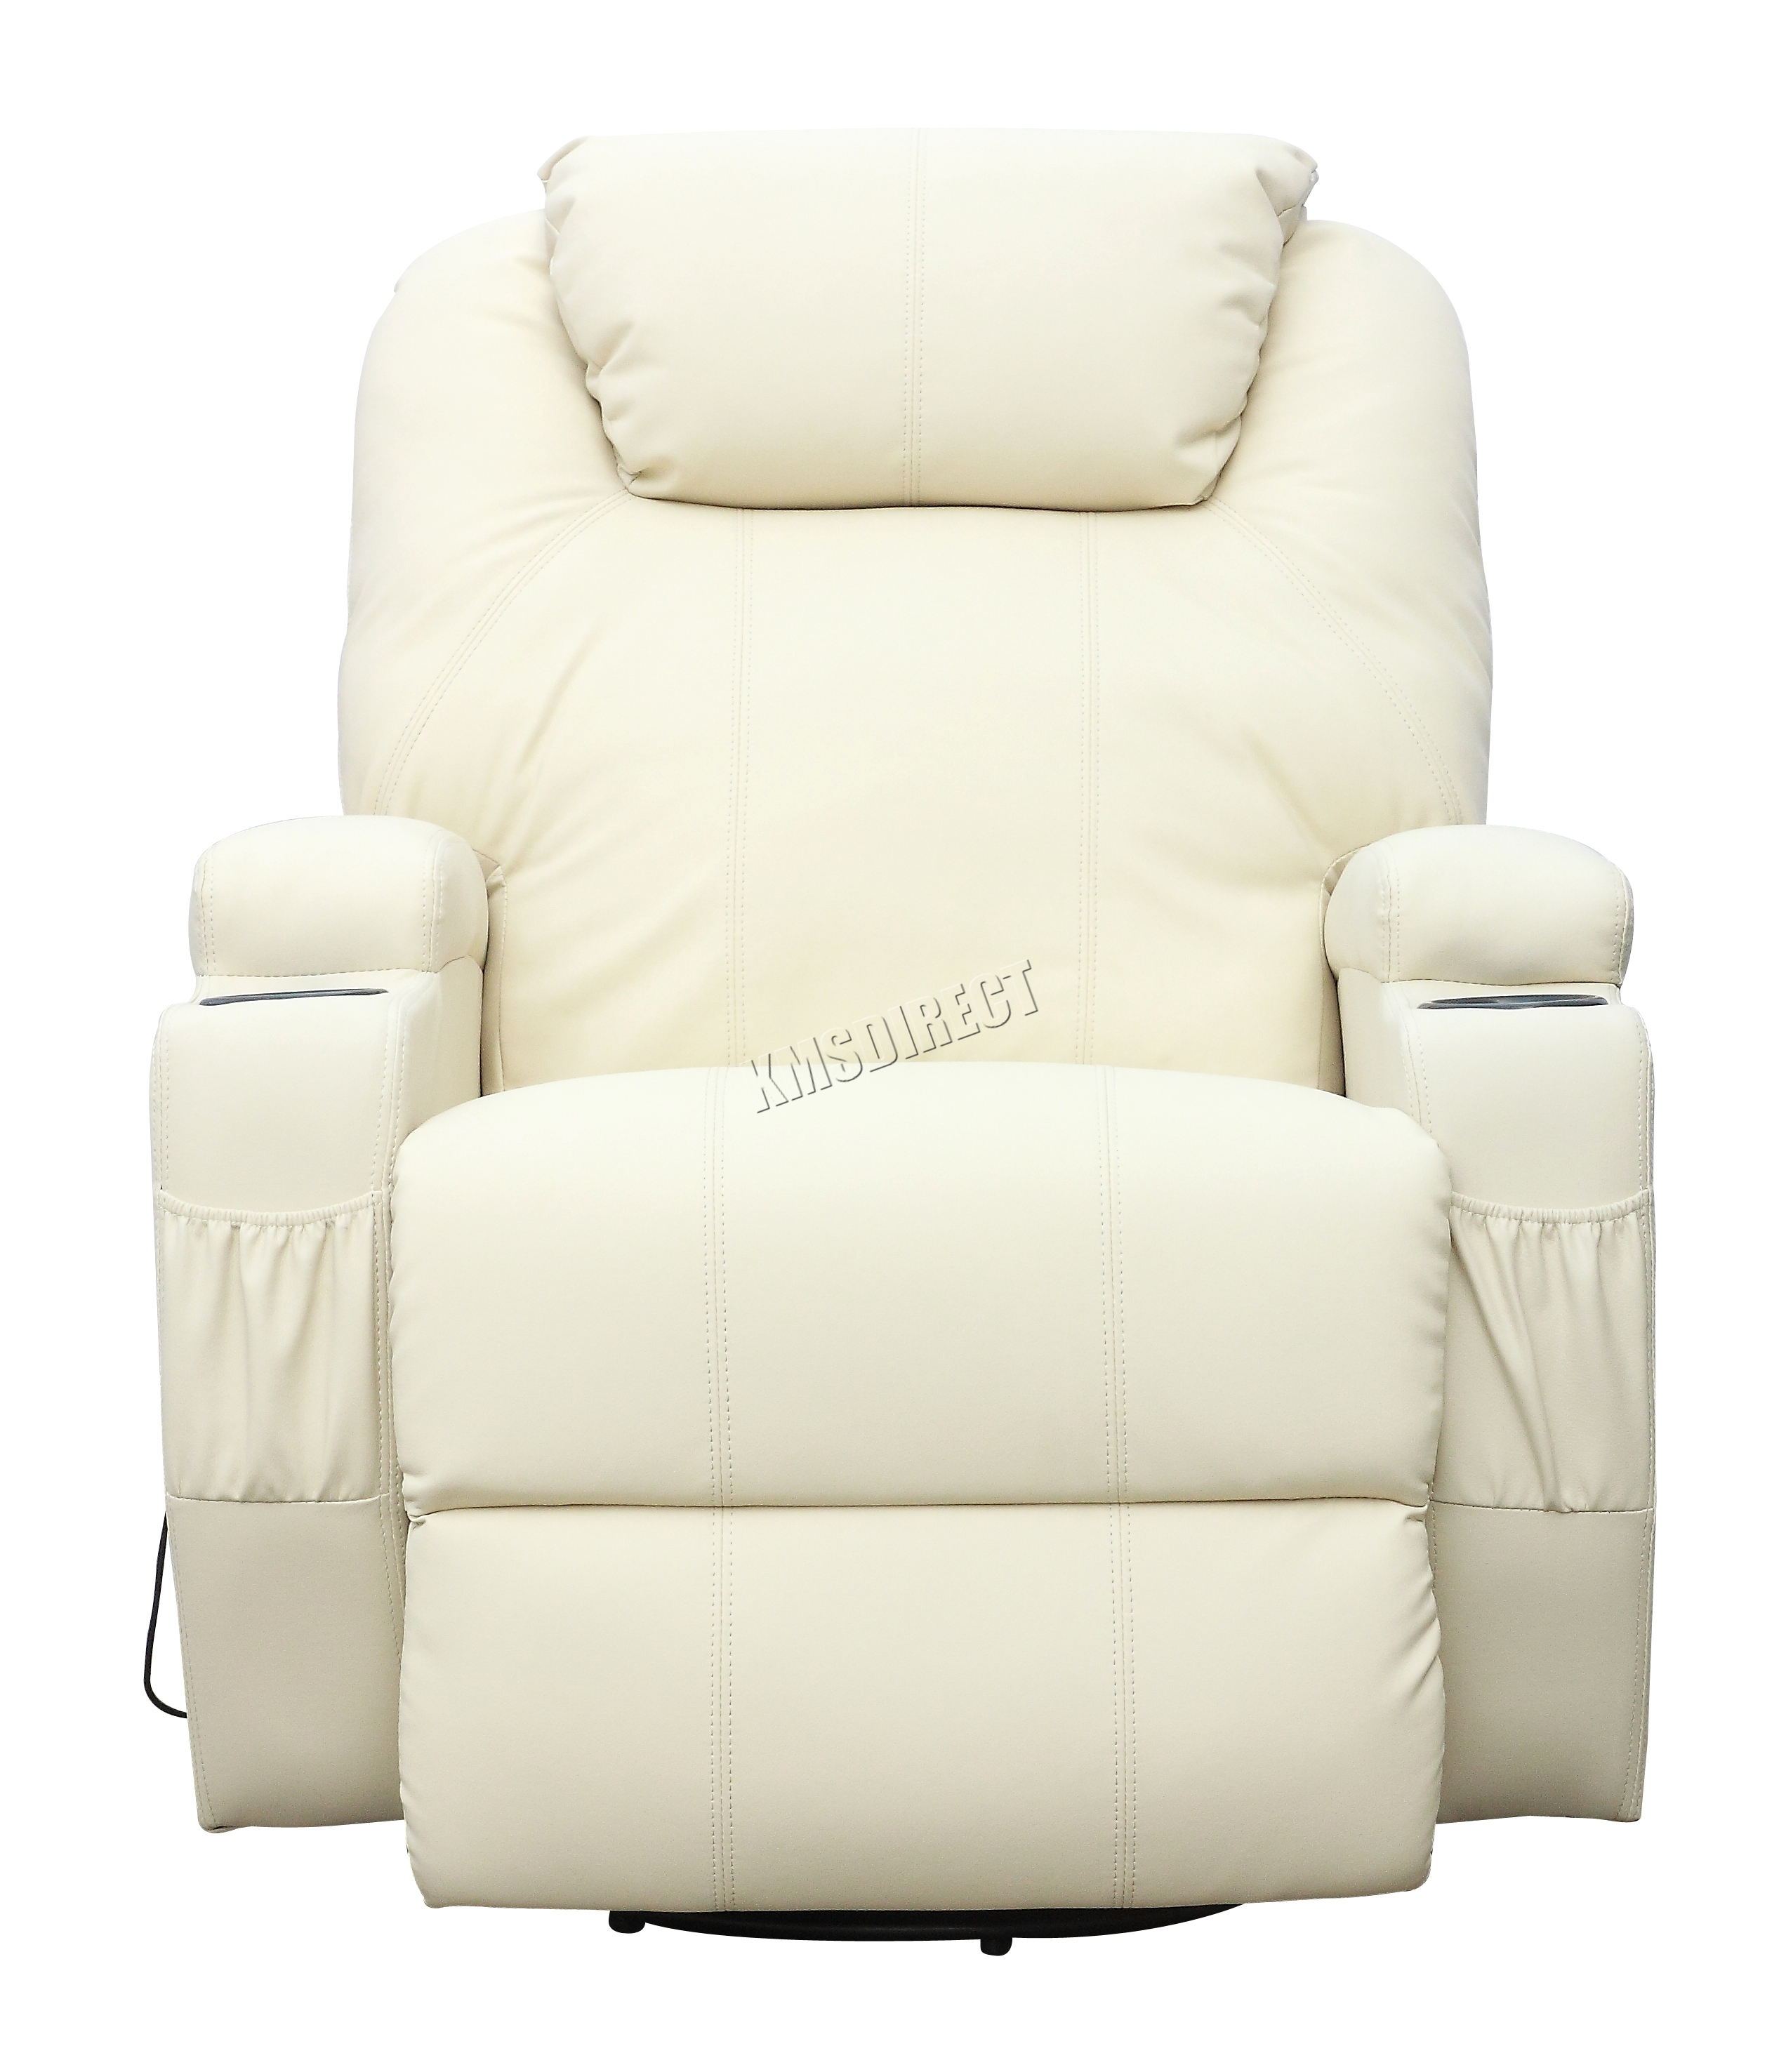 reclining massage sofa prestige furniture foxhunter bonded leather recliner chair cinema